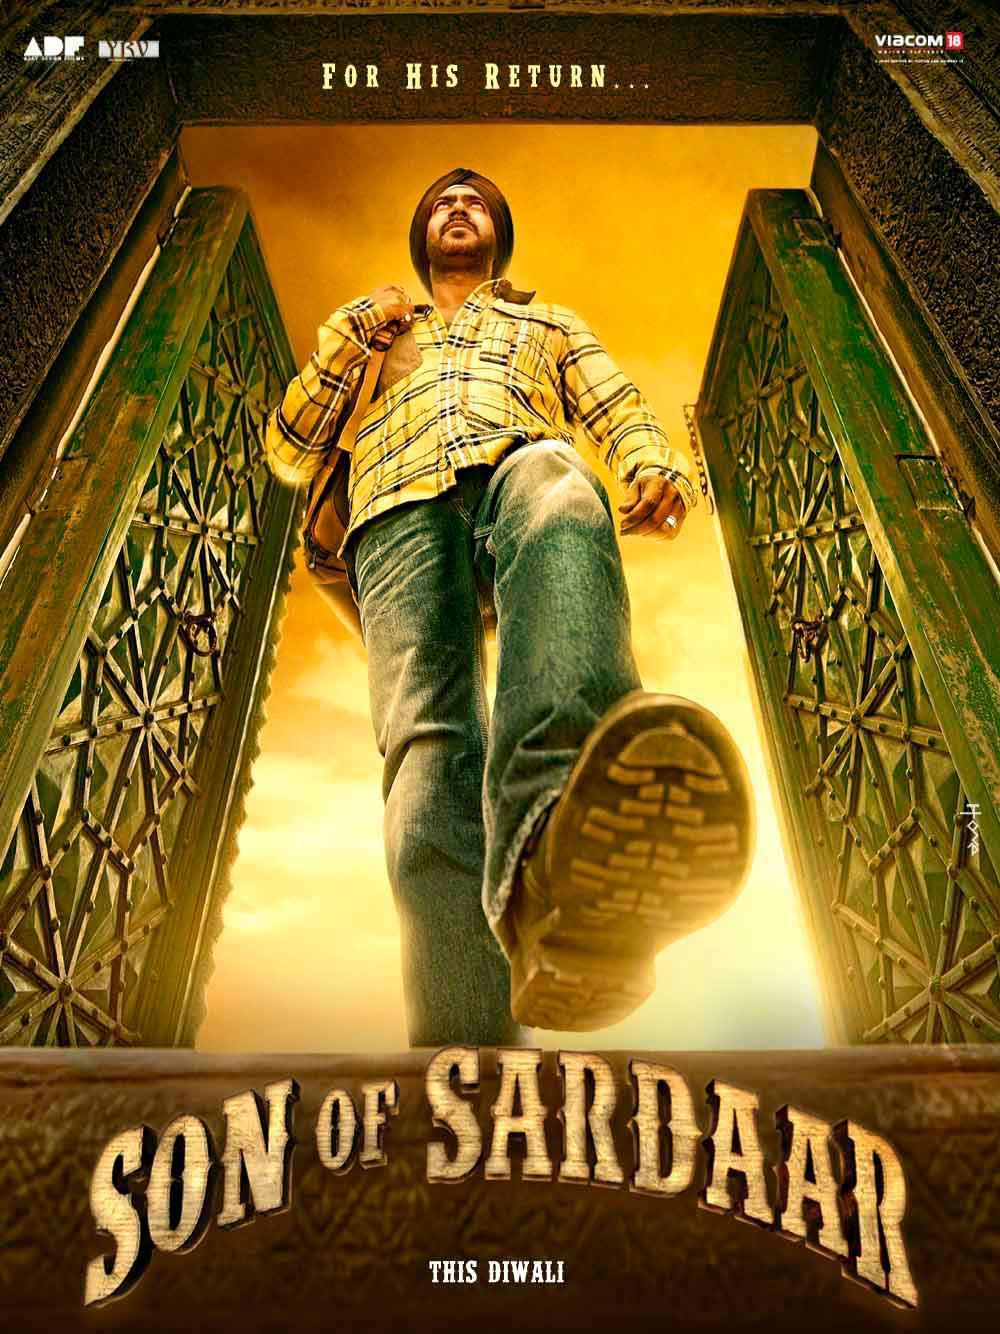 Son of Sardaar - Movie Poster #1 (Original)